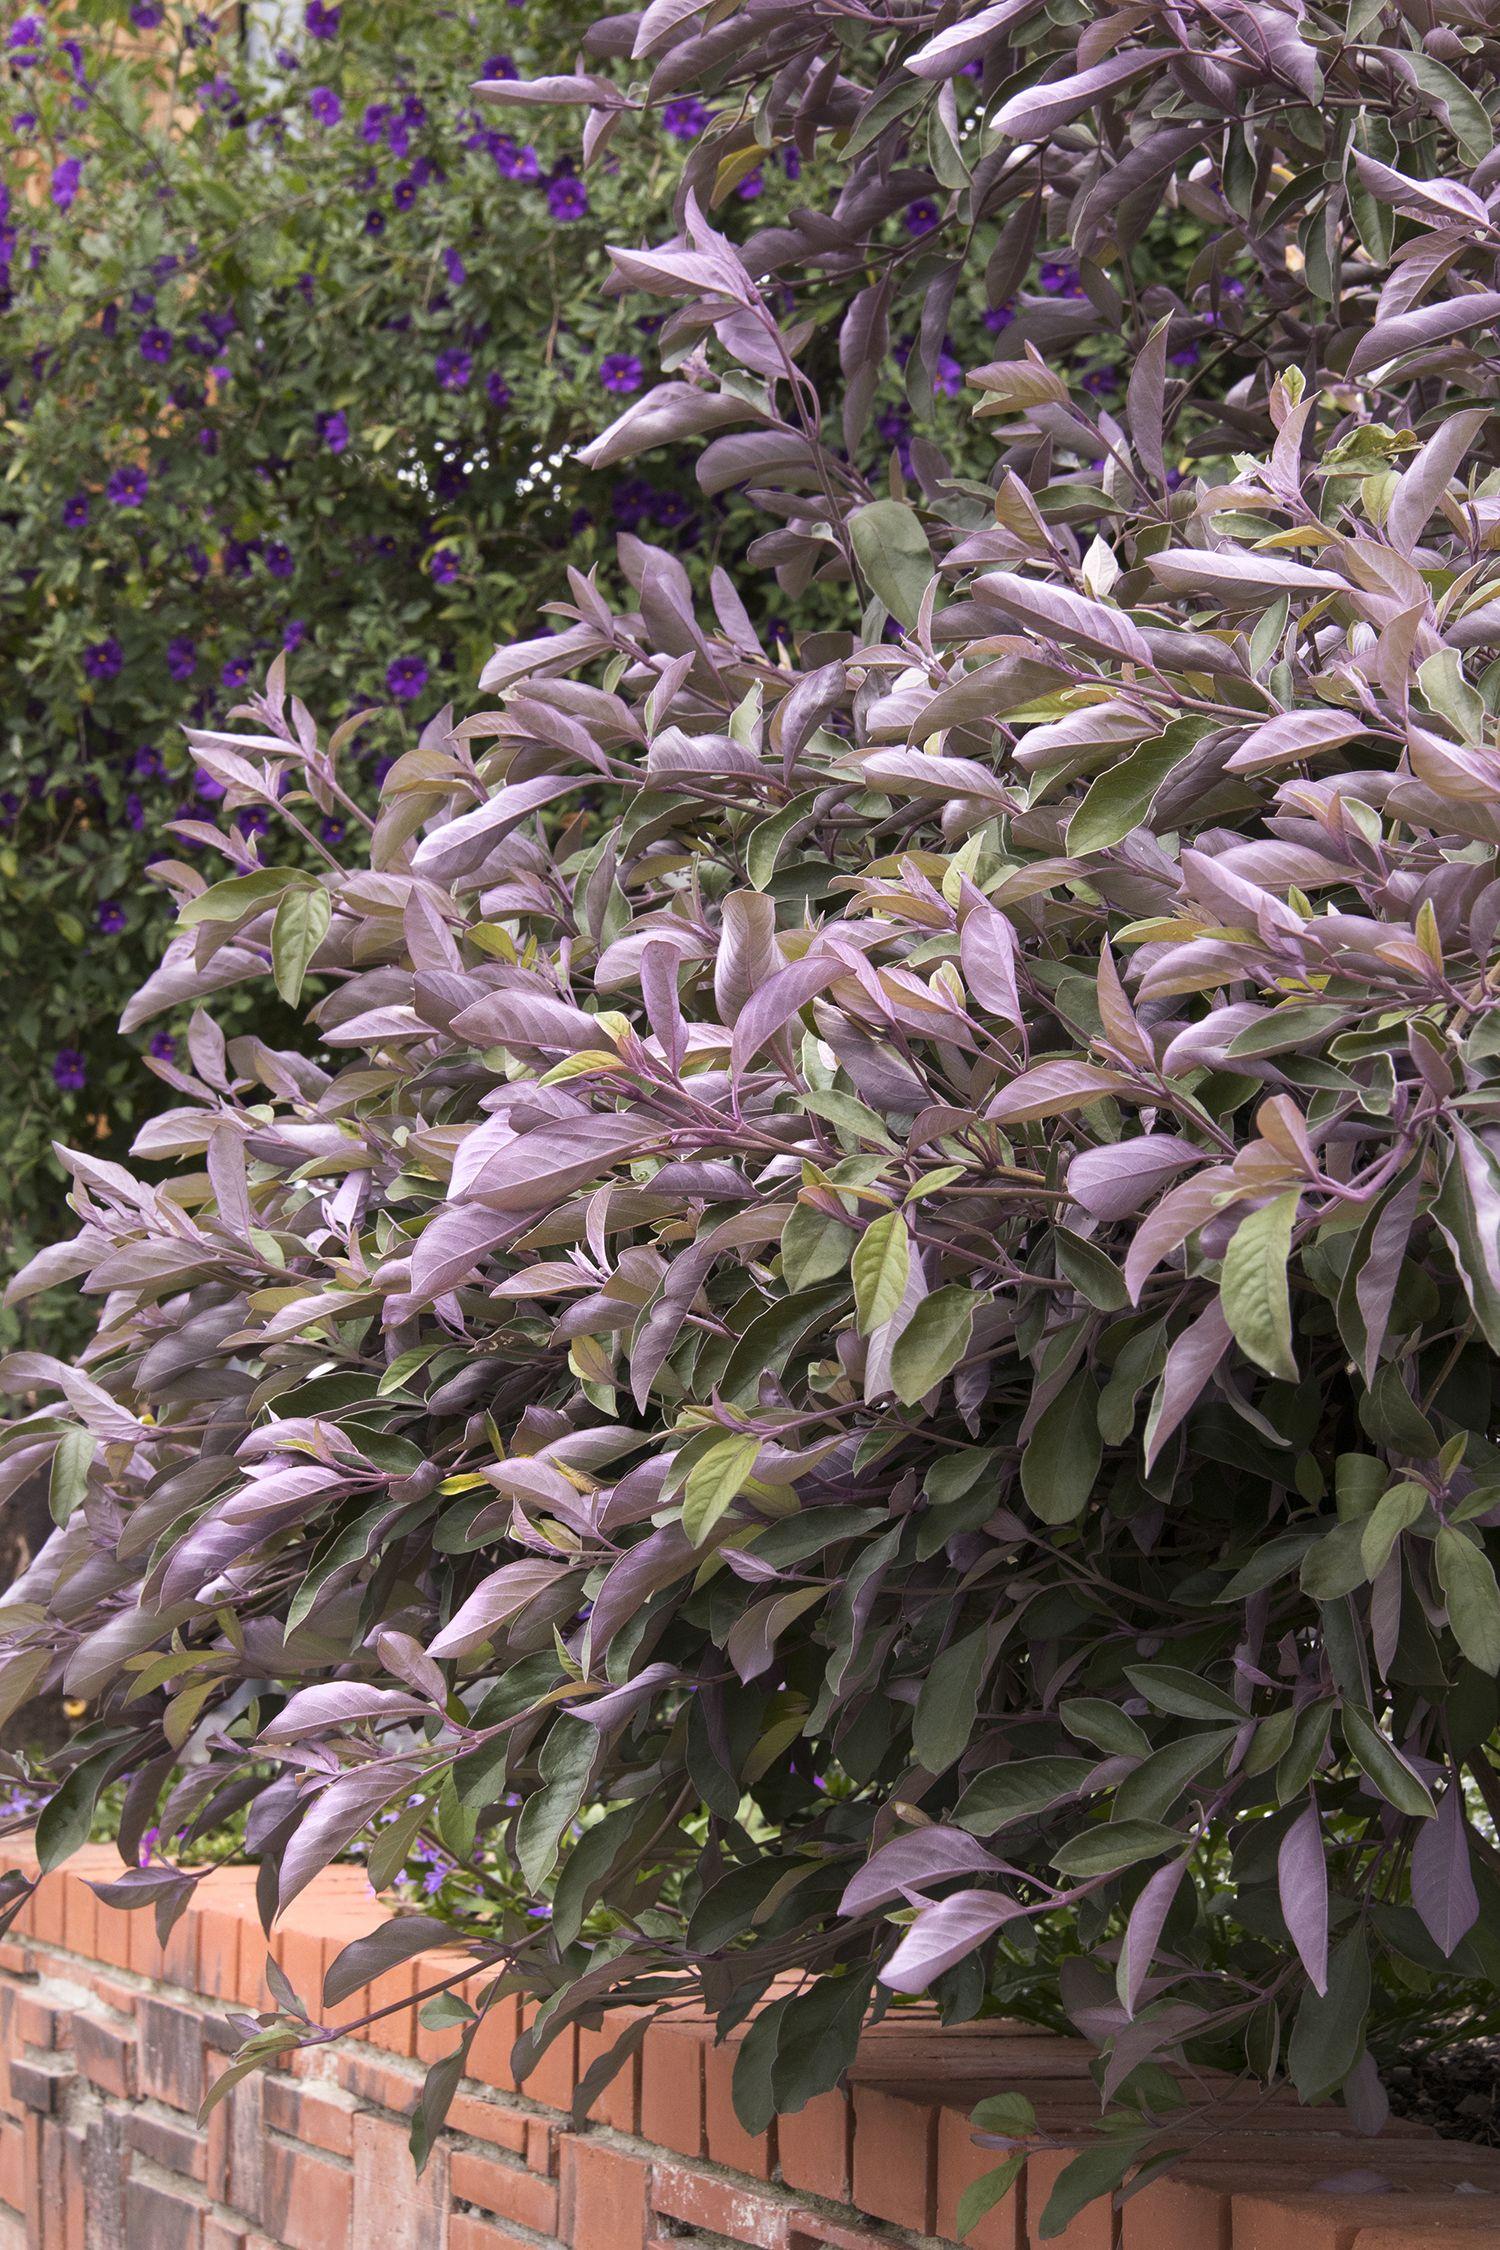 Image result for vitex trifolia purpurea with images